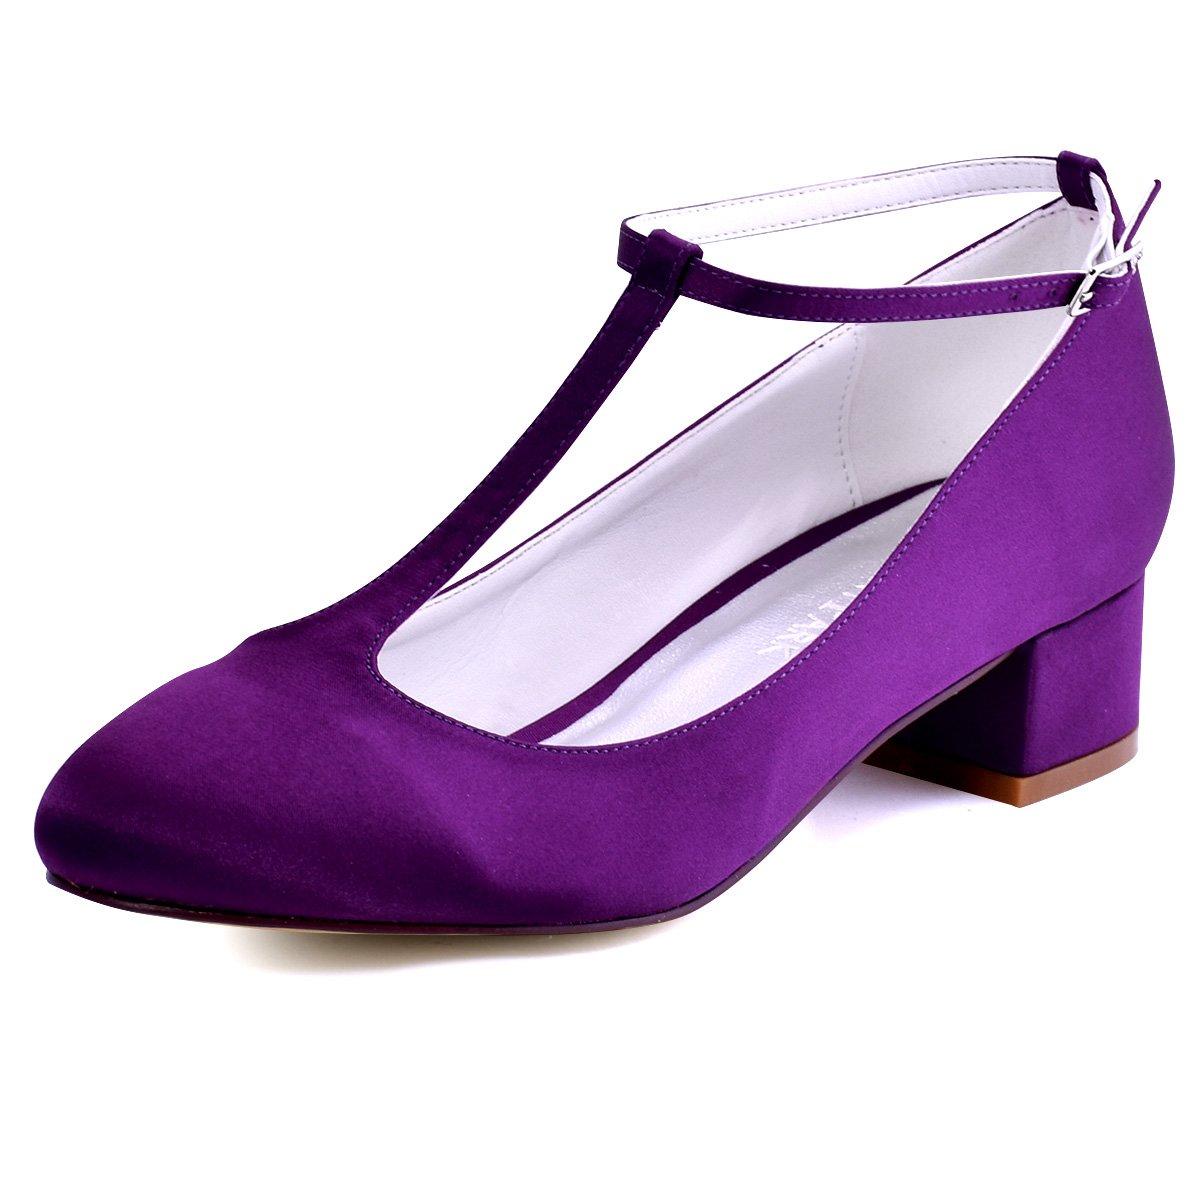 ElegantPark Mujer Cerrado Toe Chunky Tacón T-Correa Bombas Satén Zapatos de vestir de noche 39 EU|Morado